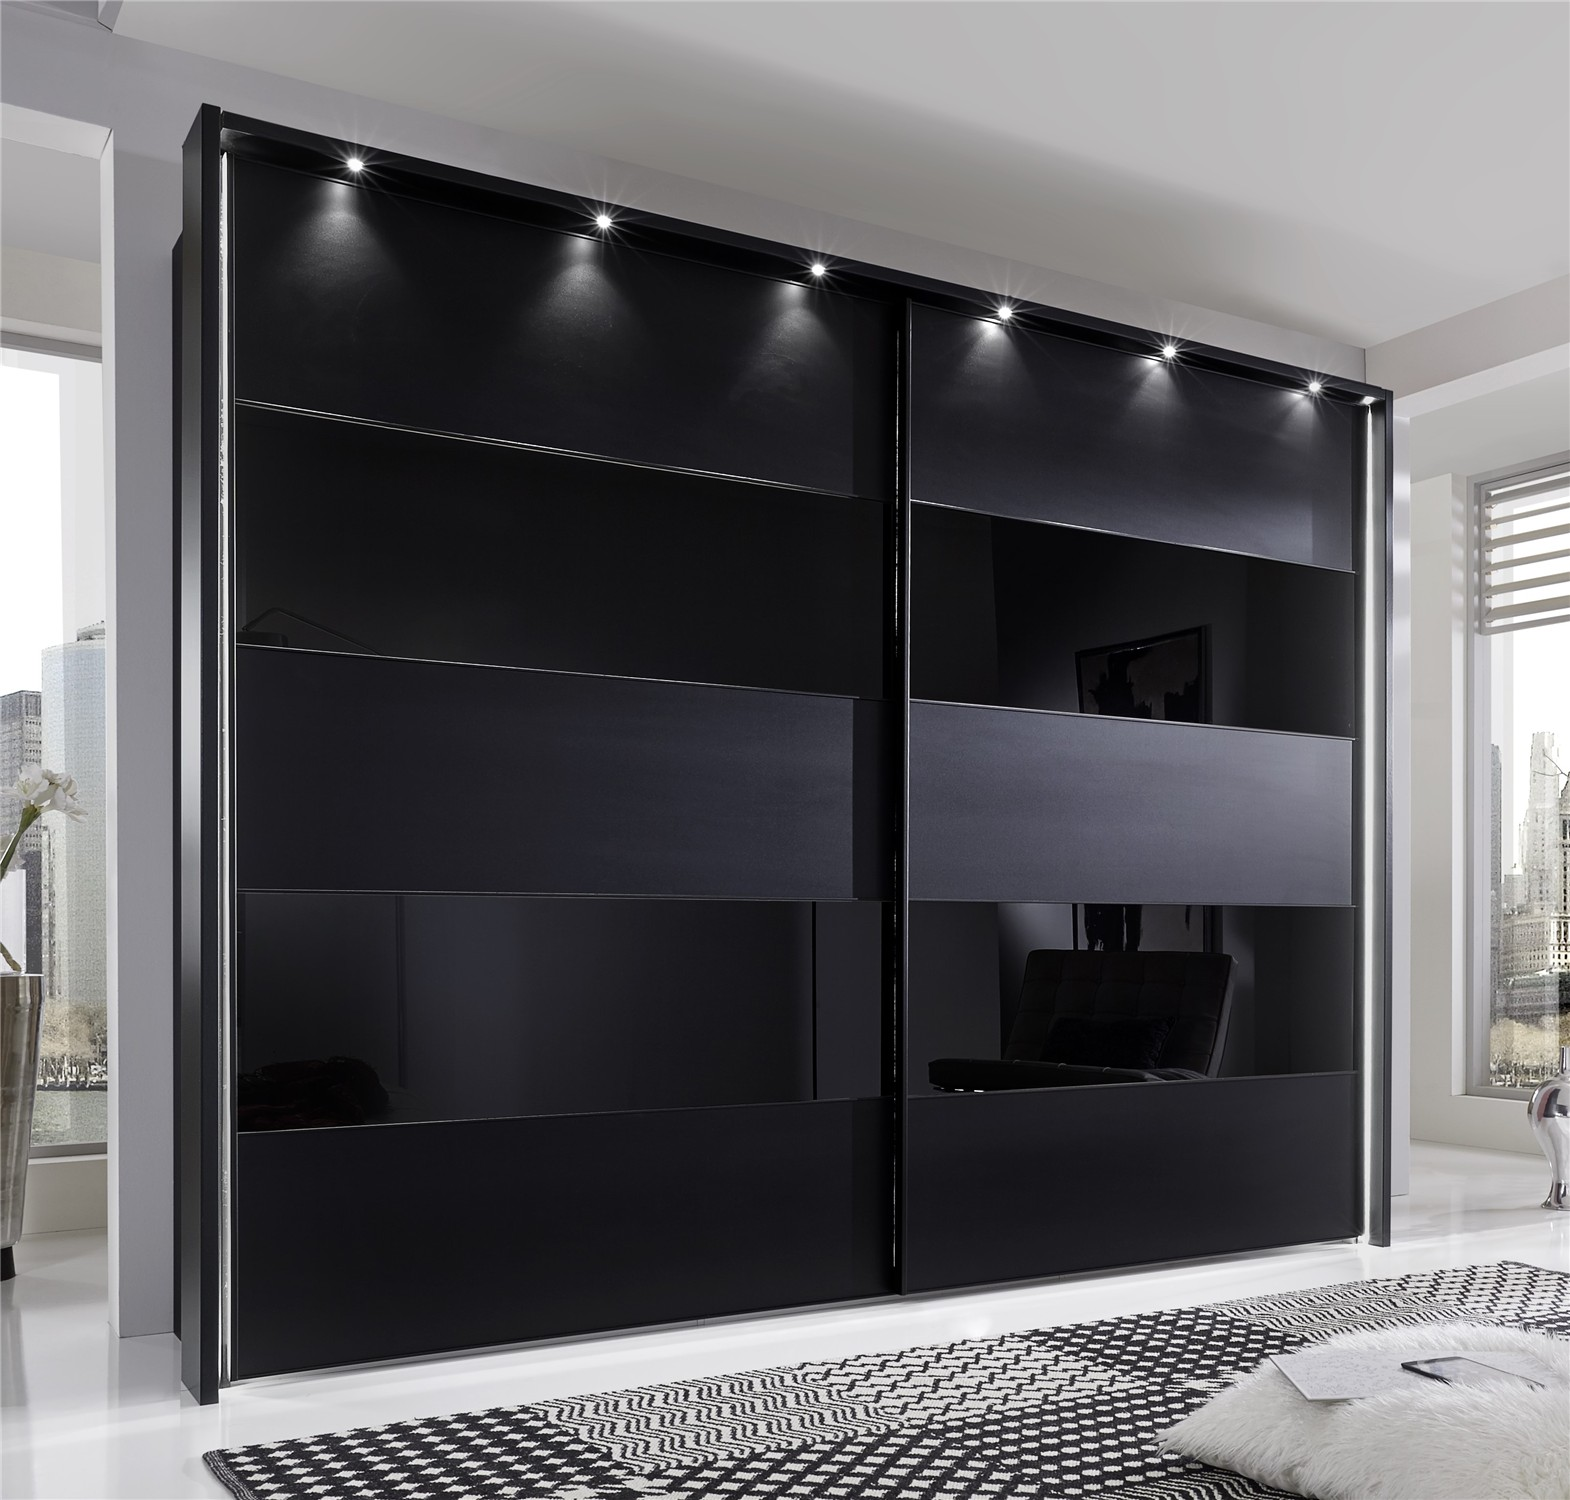 Stylform Phoebe 200 300cm Black Matt Glass Sliding Door Wardrobe